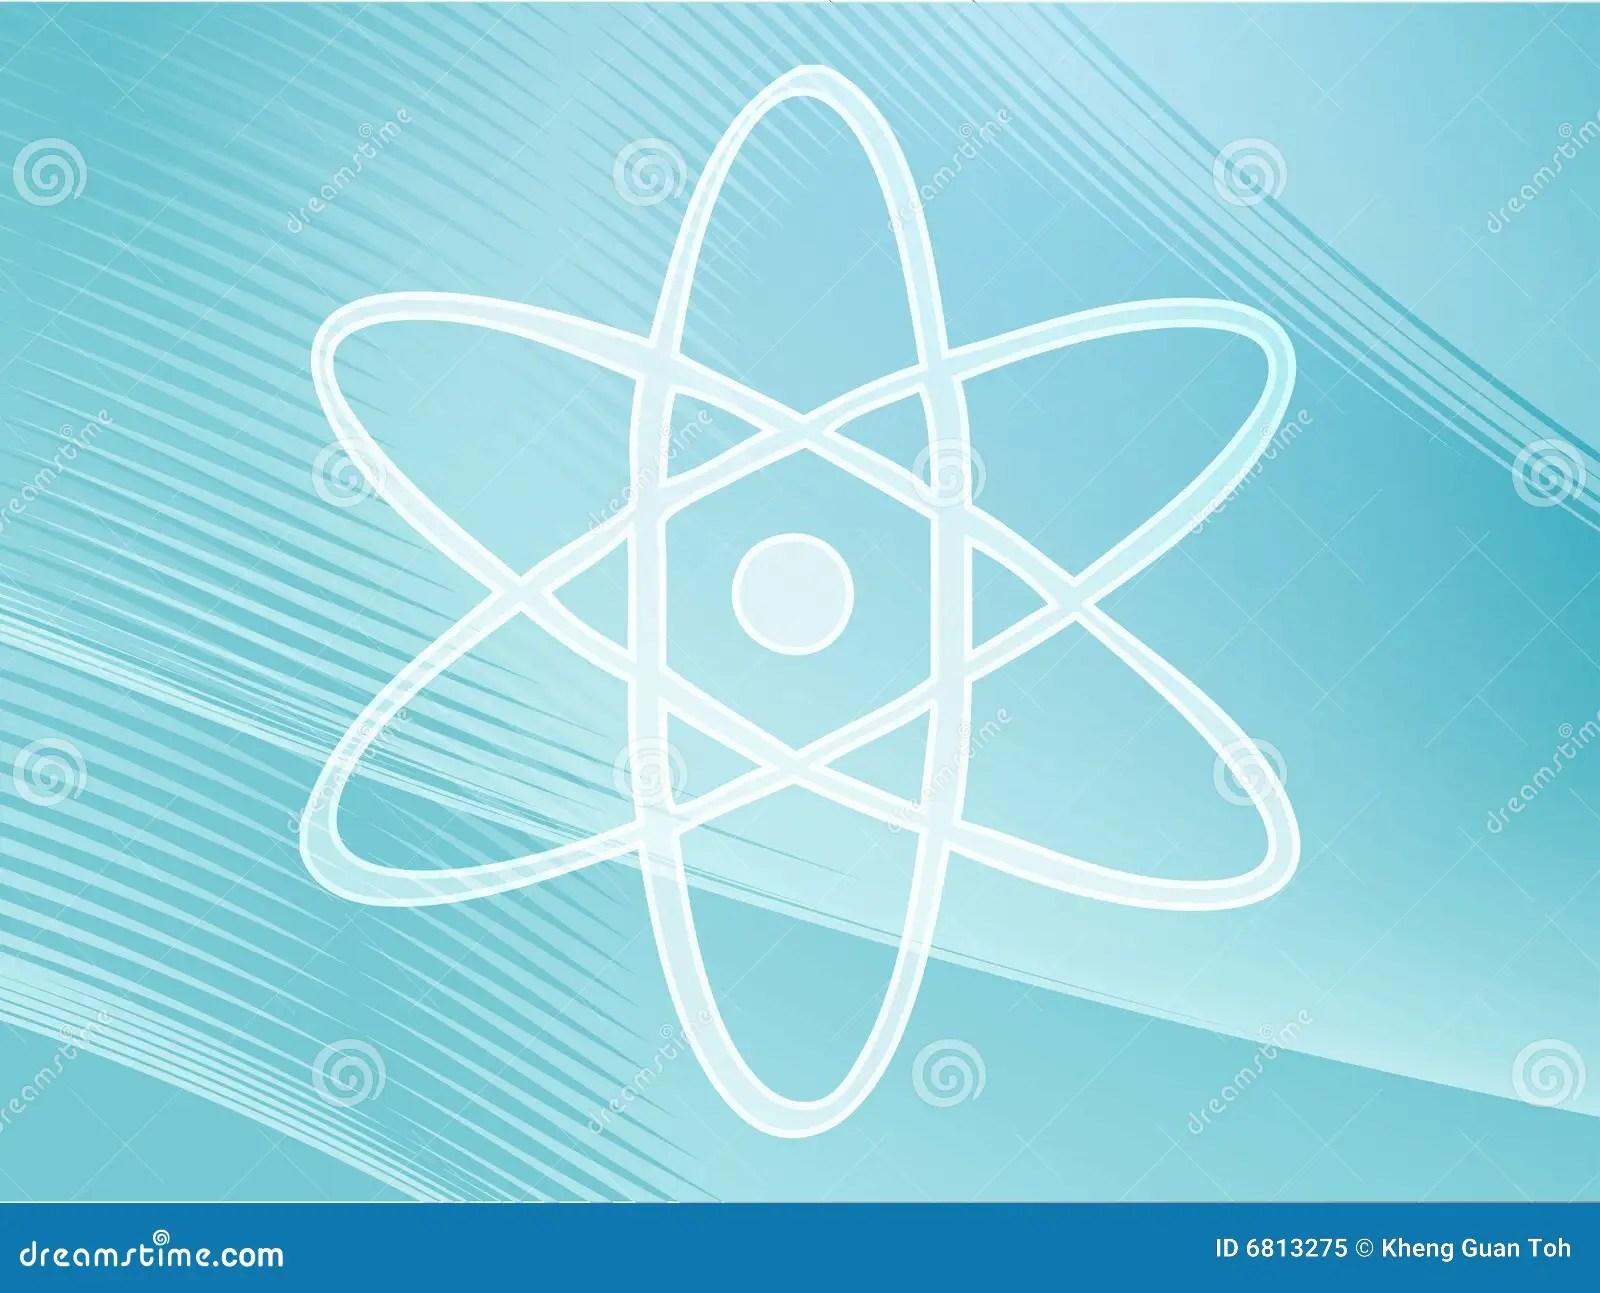 atomic symbol diagram rj45 to rj12 wiring stock vector illustration of